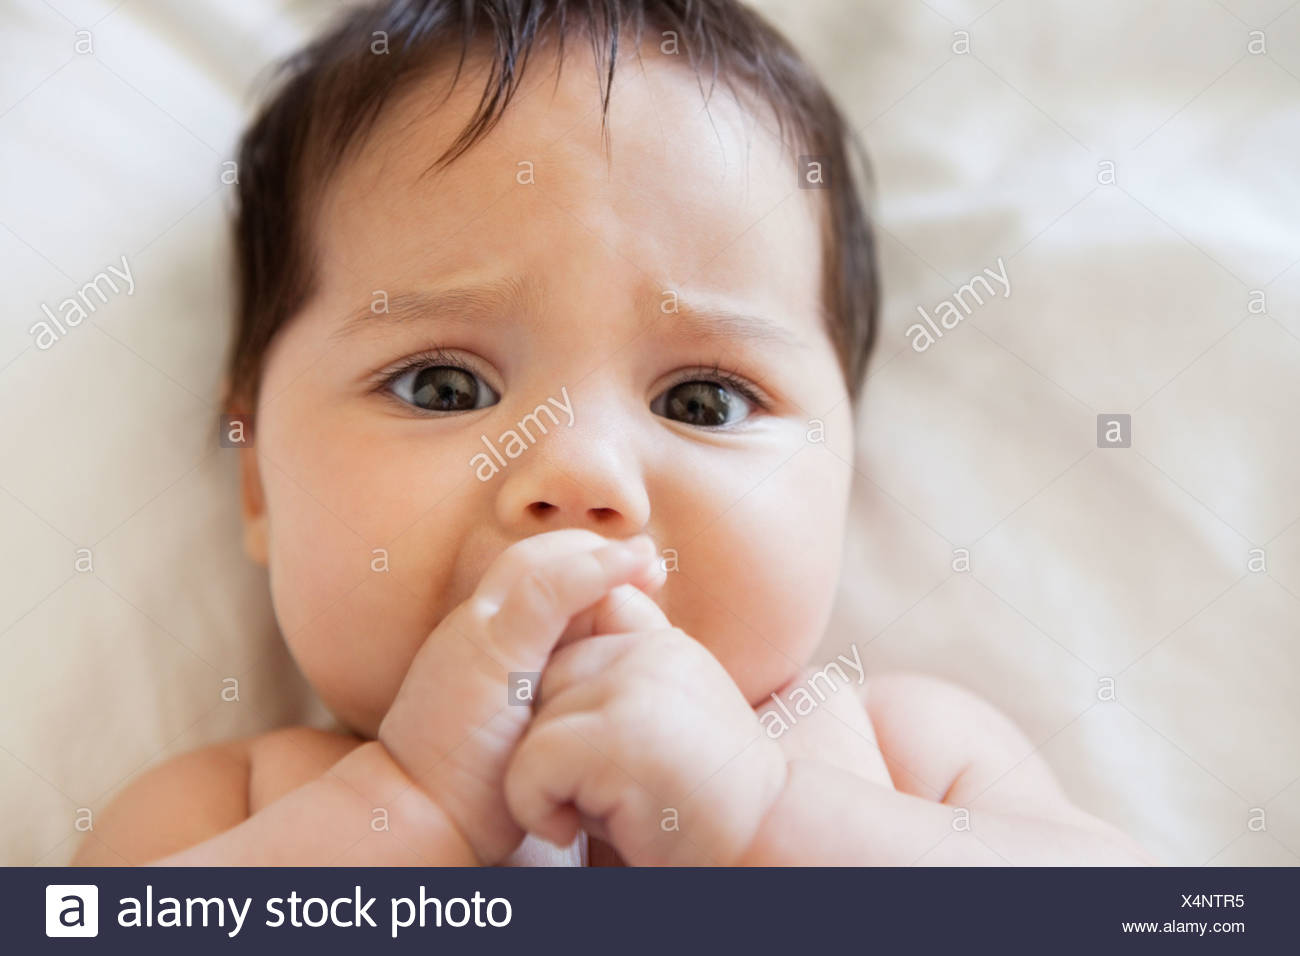 Fussy baby girl sucking her thumb - Stock Image